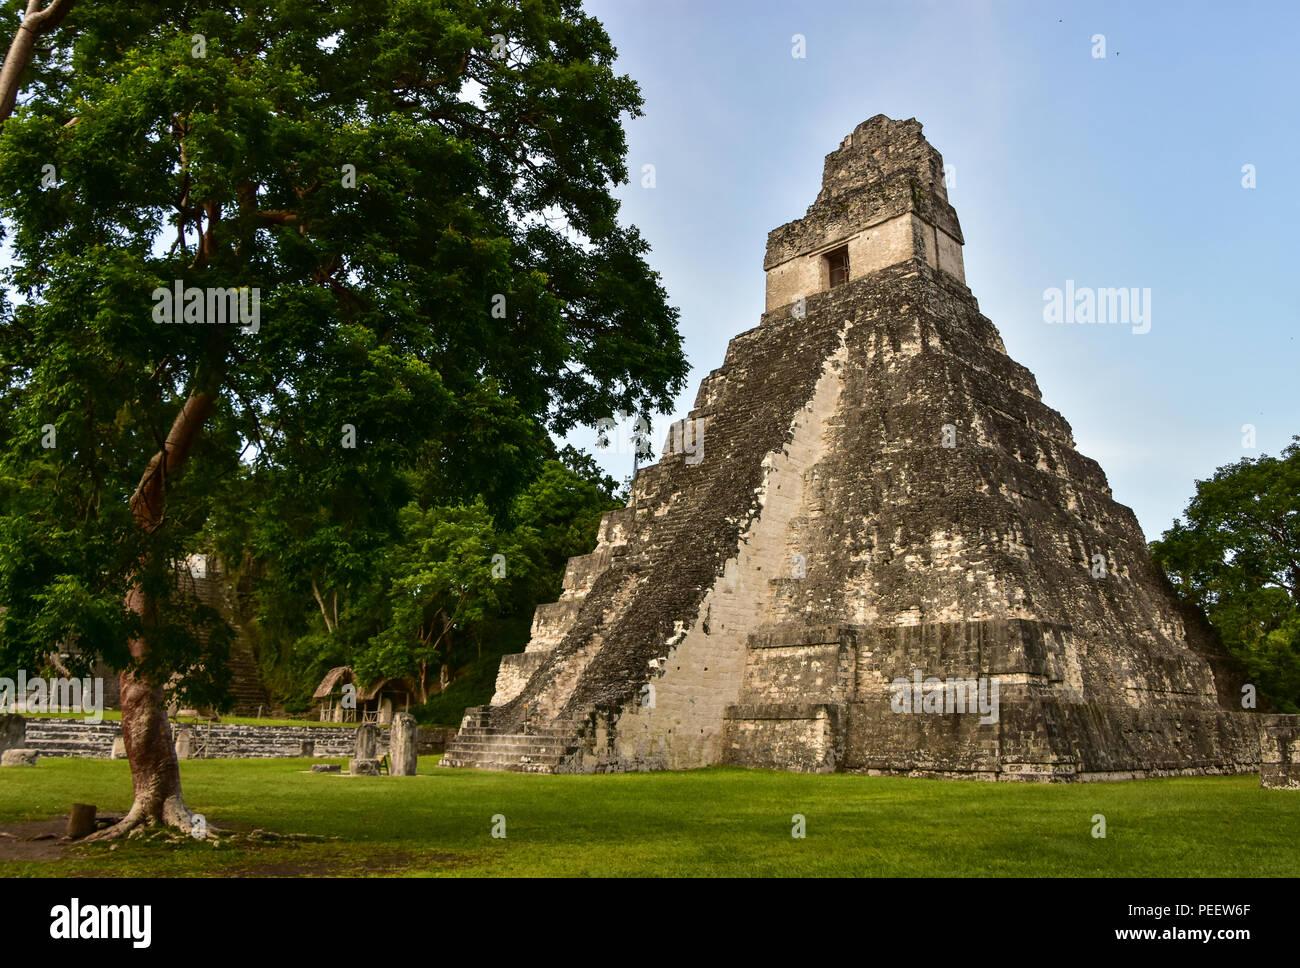 Tikal National Park, Guatemala - Stock Image